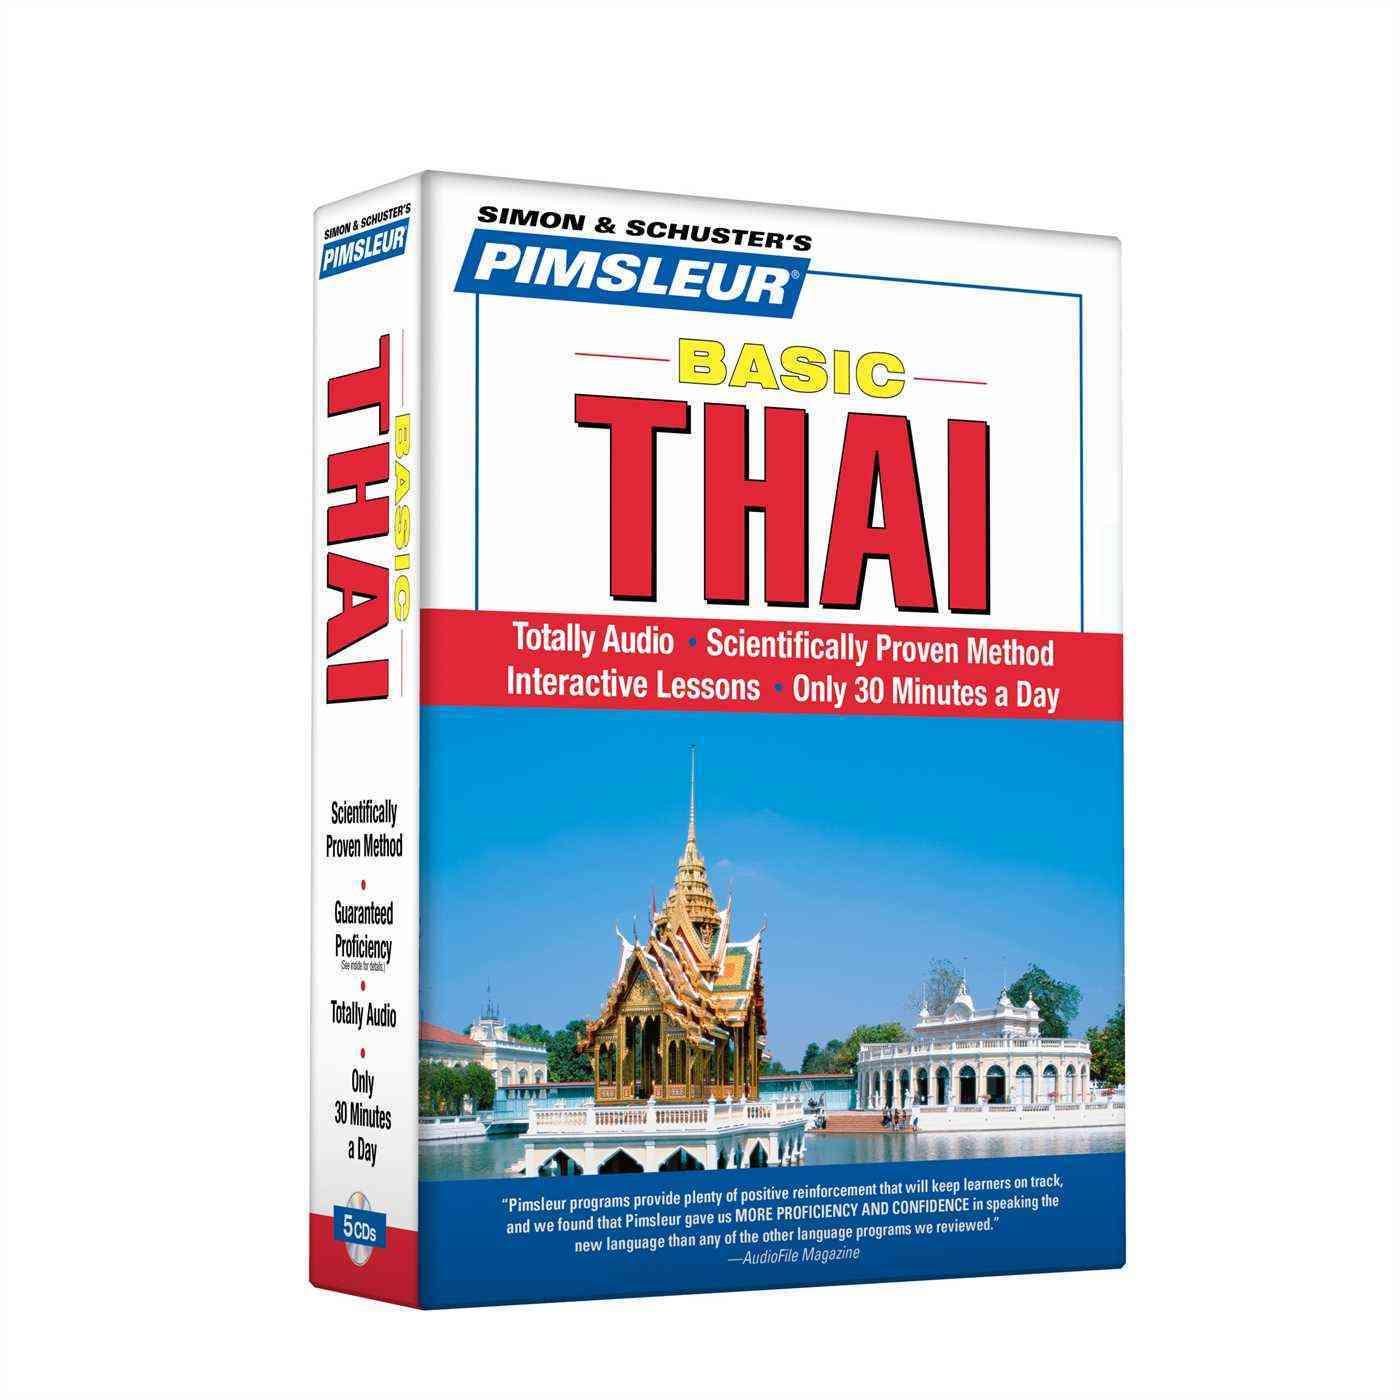 Pimsleur Basic Thai (CD-Audio)